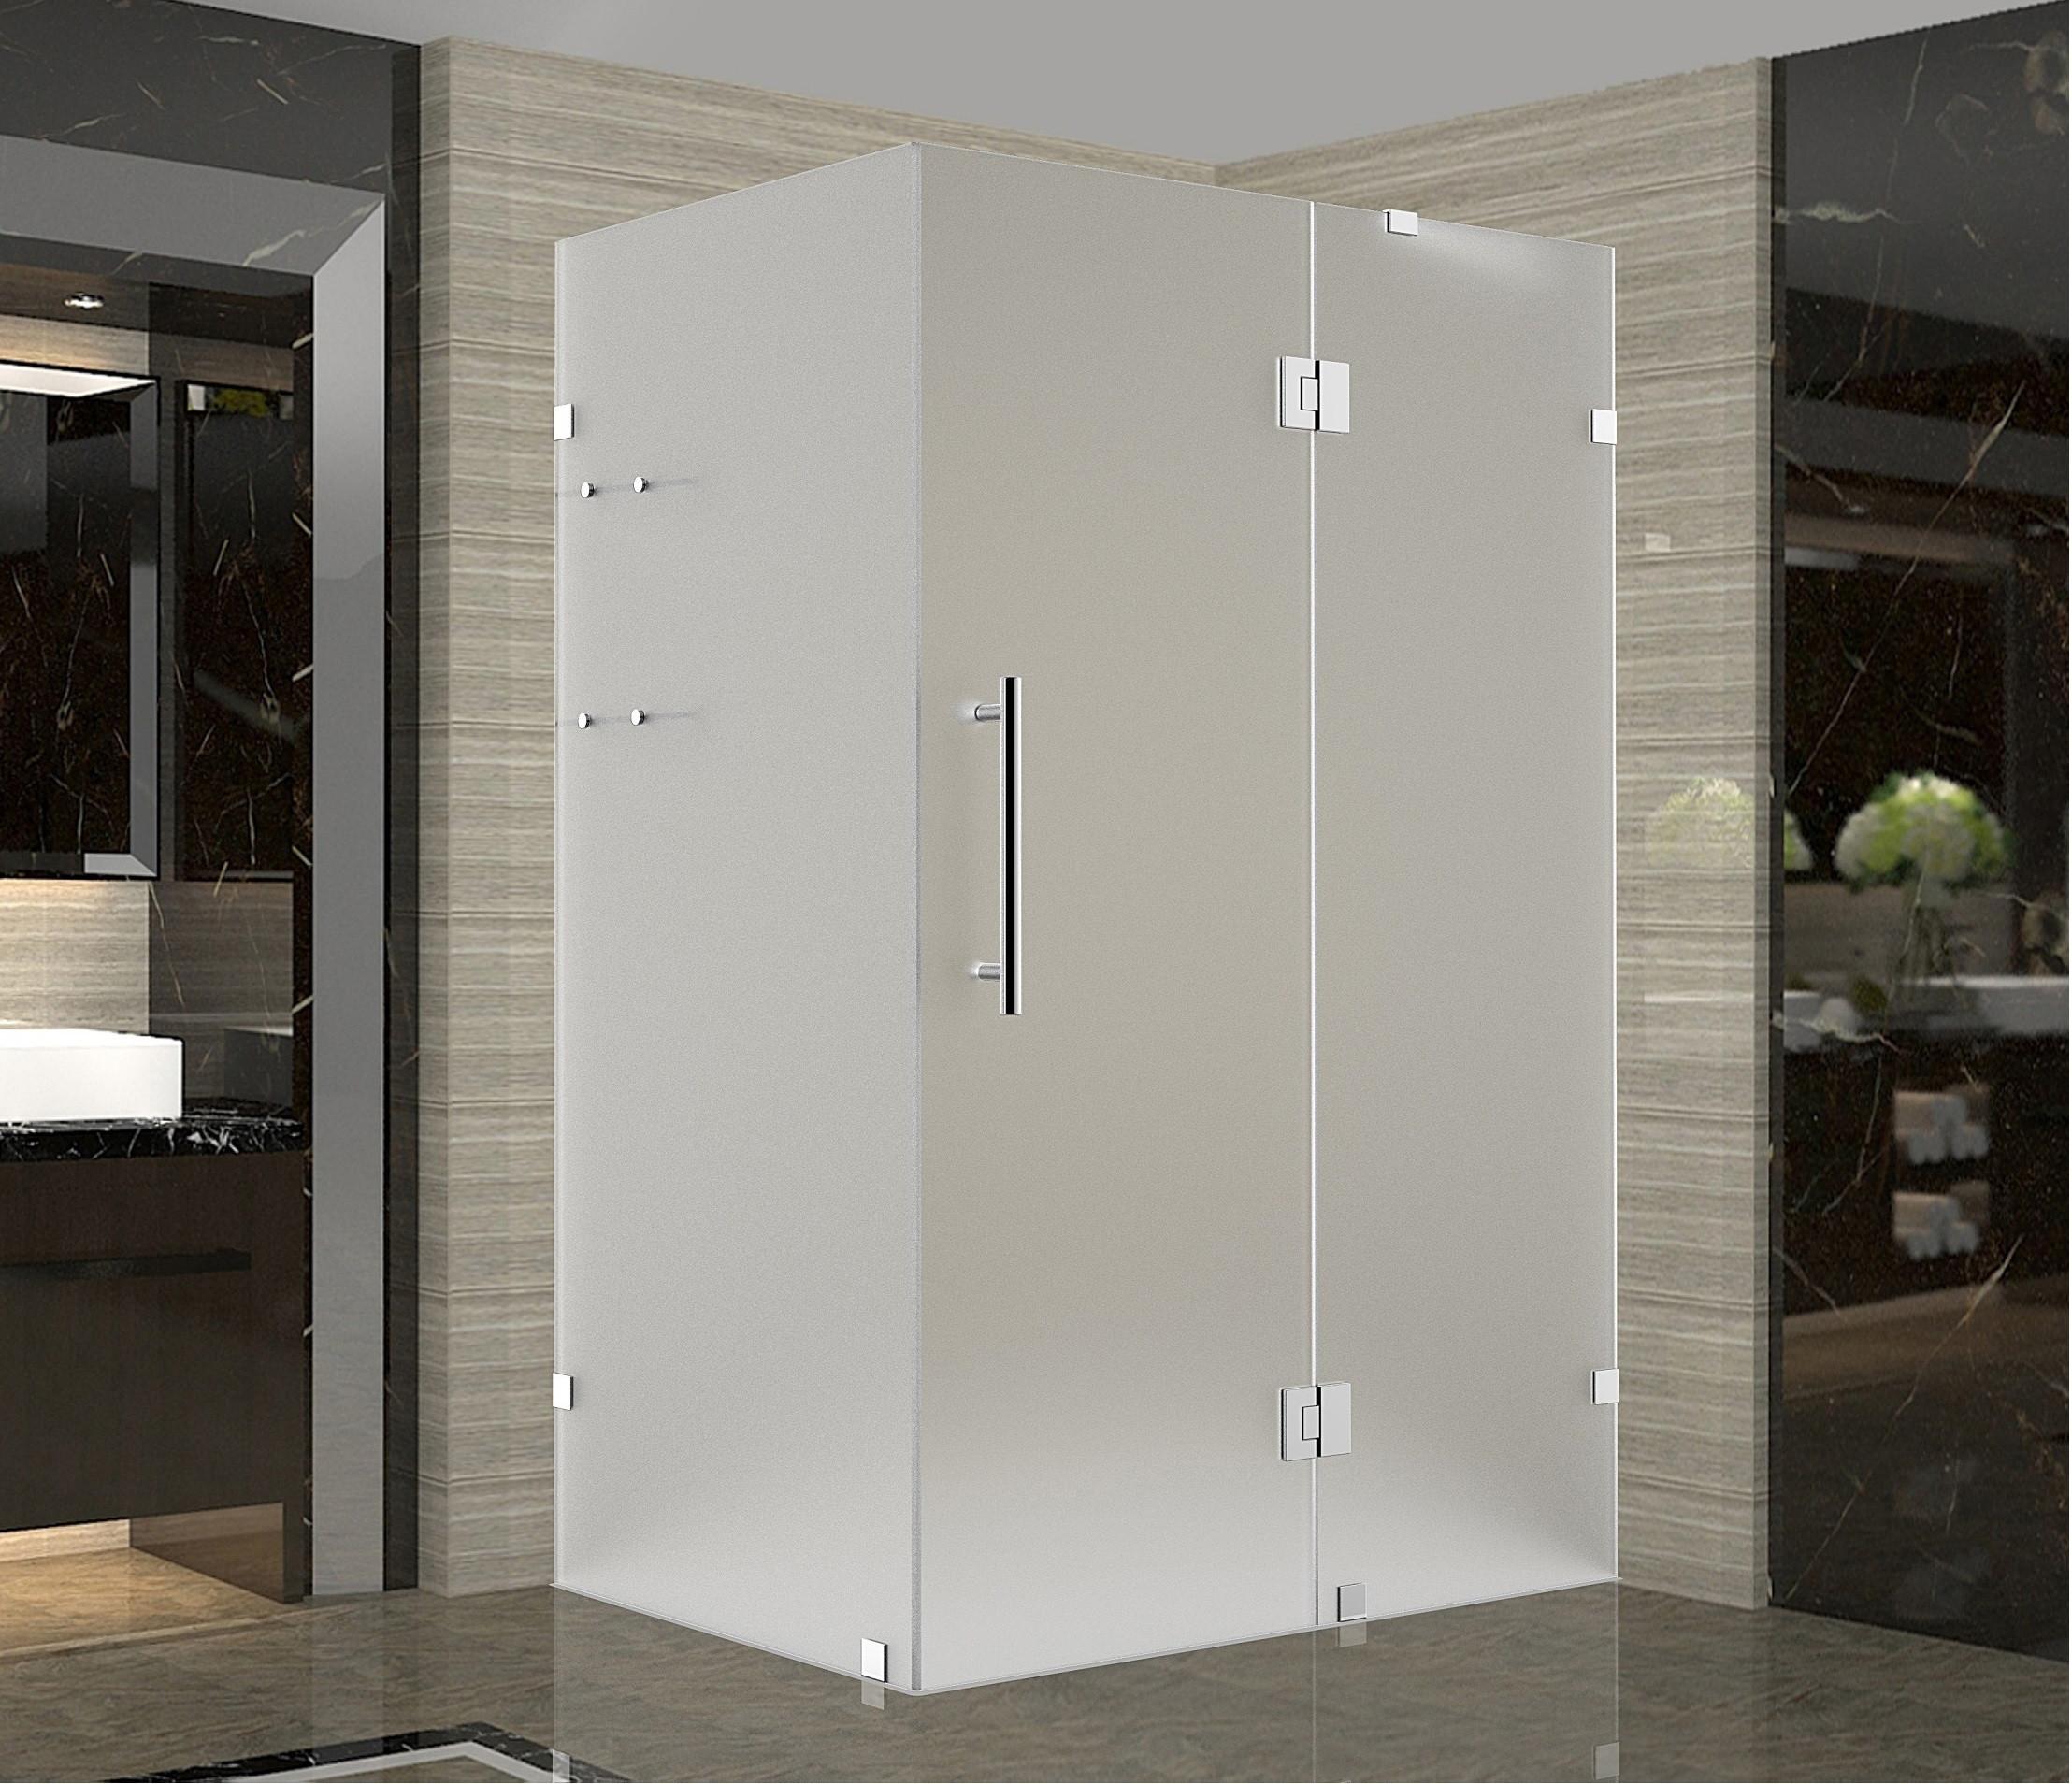 Aston Global SEN992F-SS-3632-10 Stainless Steel Completely Frameless Frosted Shower Enclosure